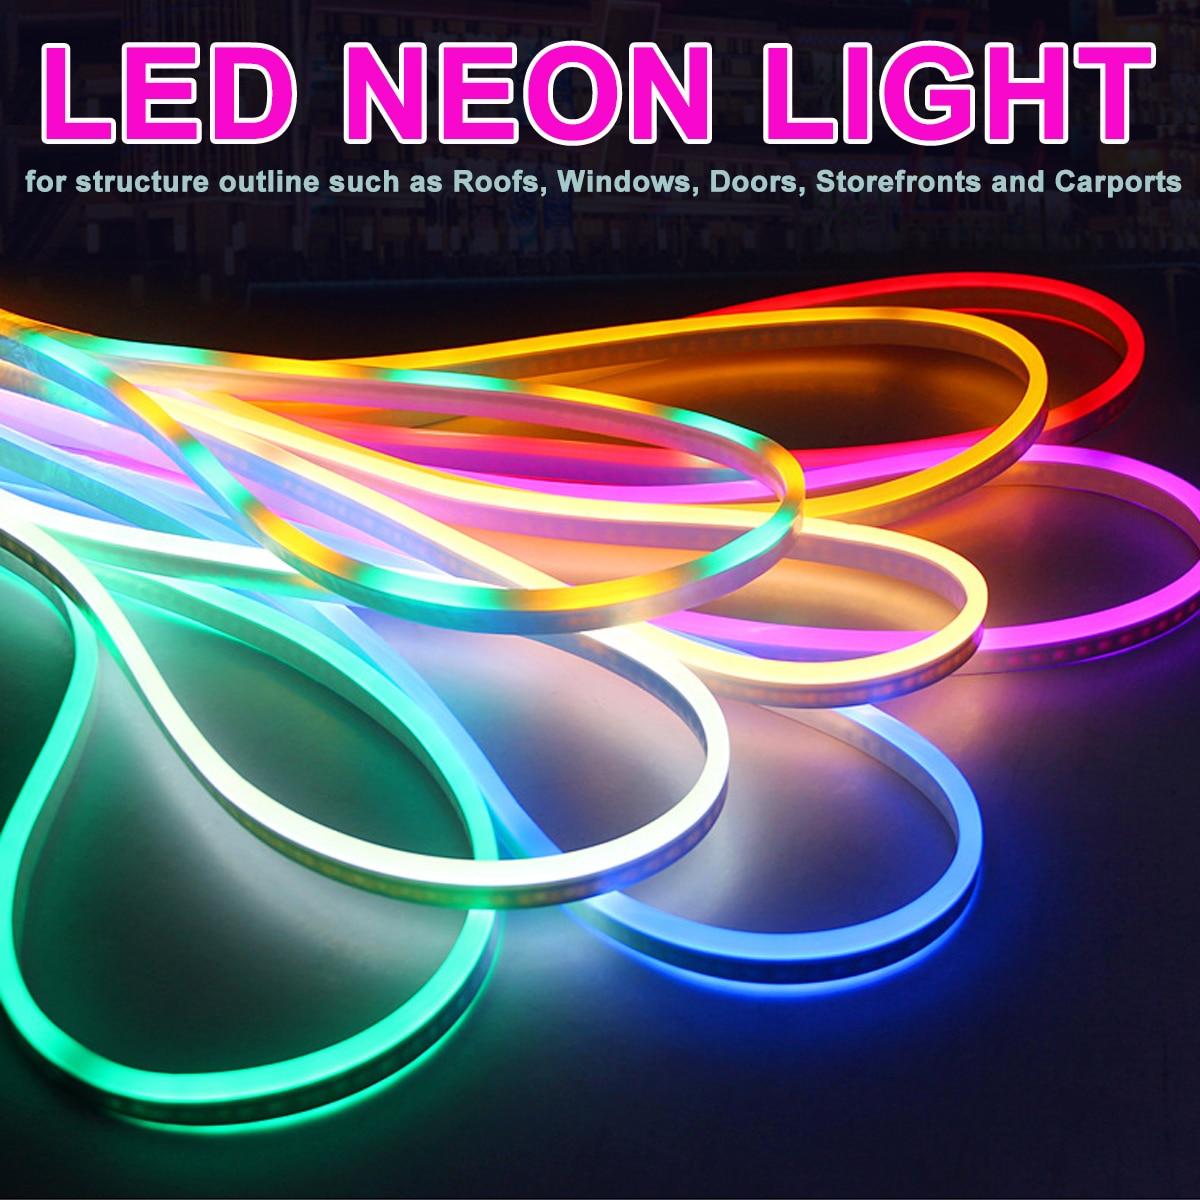 LED Neon Strip 120LED/M 2835 flexible Neon IP65 Waterproof rope light  Decorative Strip 1M/2M/3M/4M/5M/10M/15M/20M AC 220V|LED Strips| - AliExpress